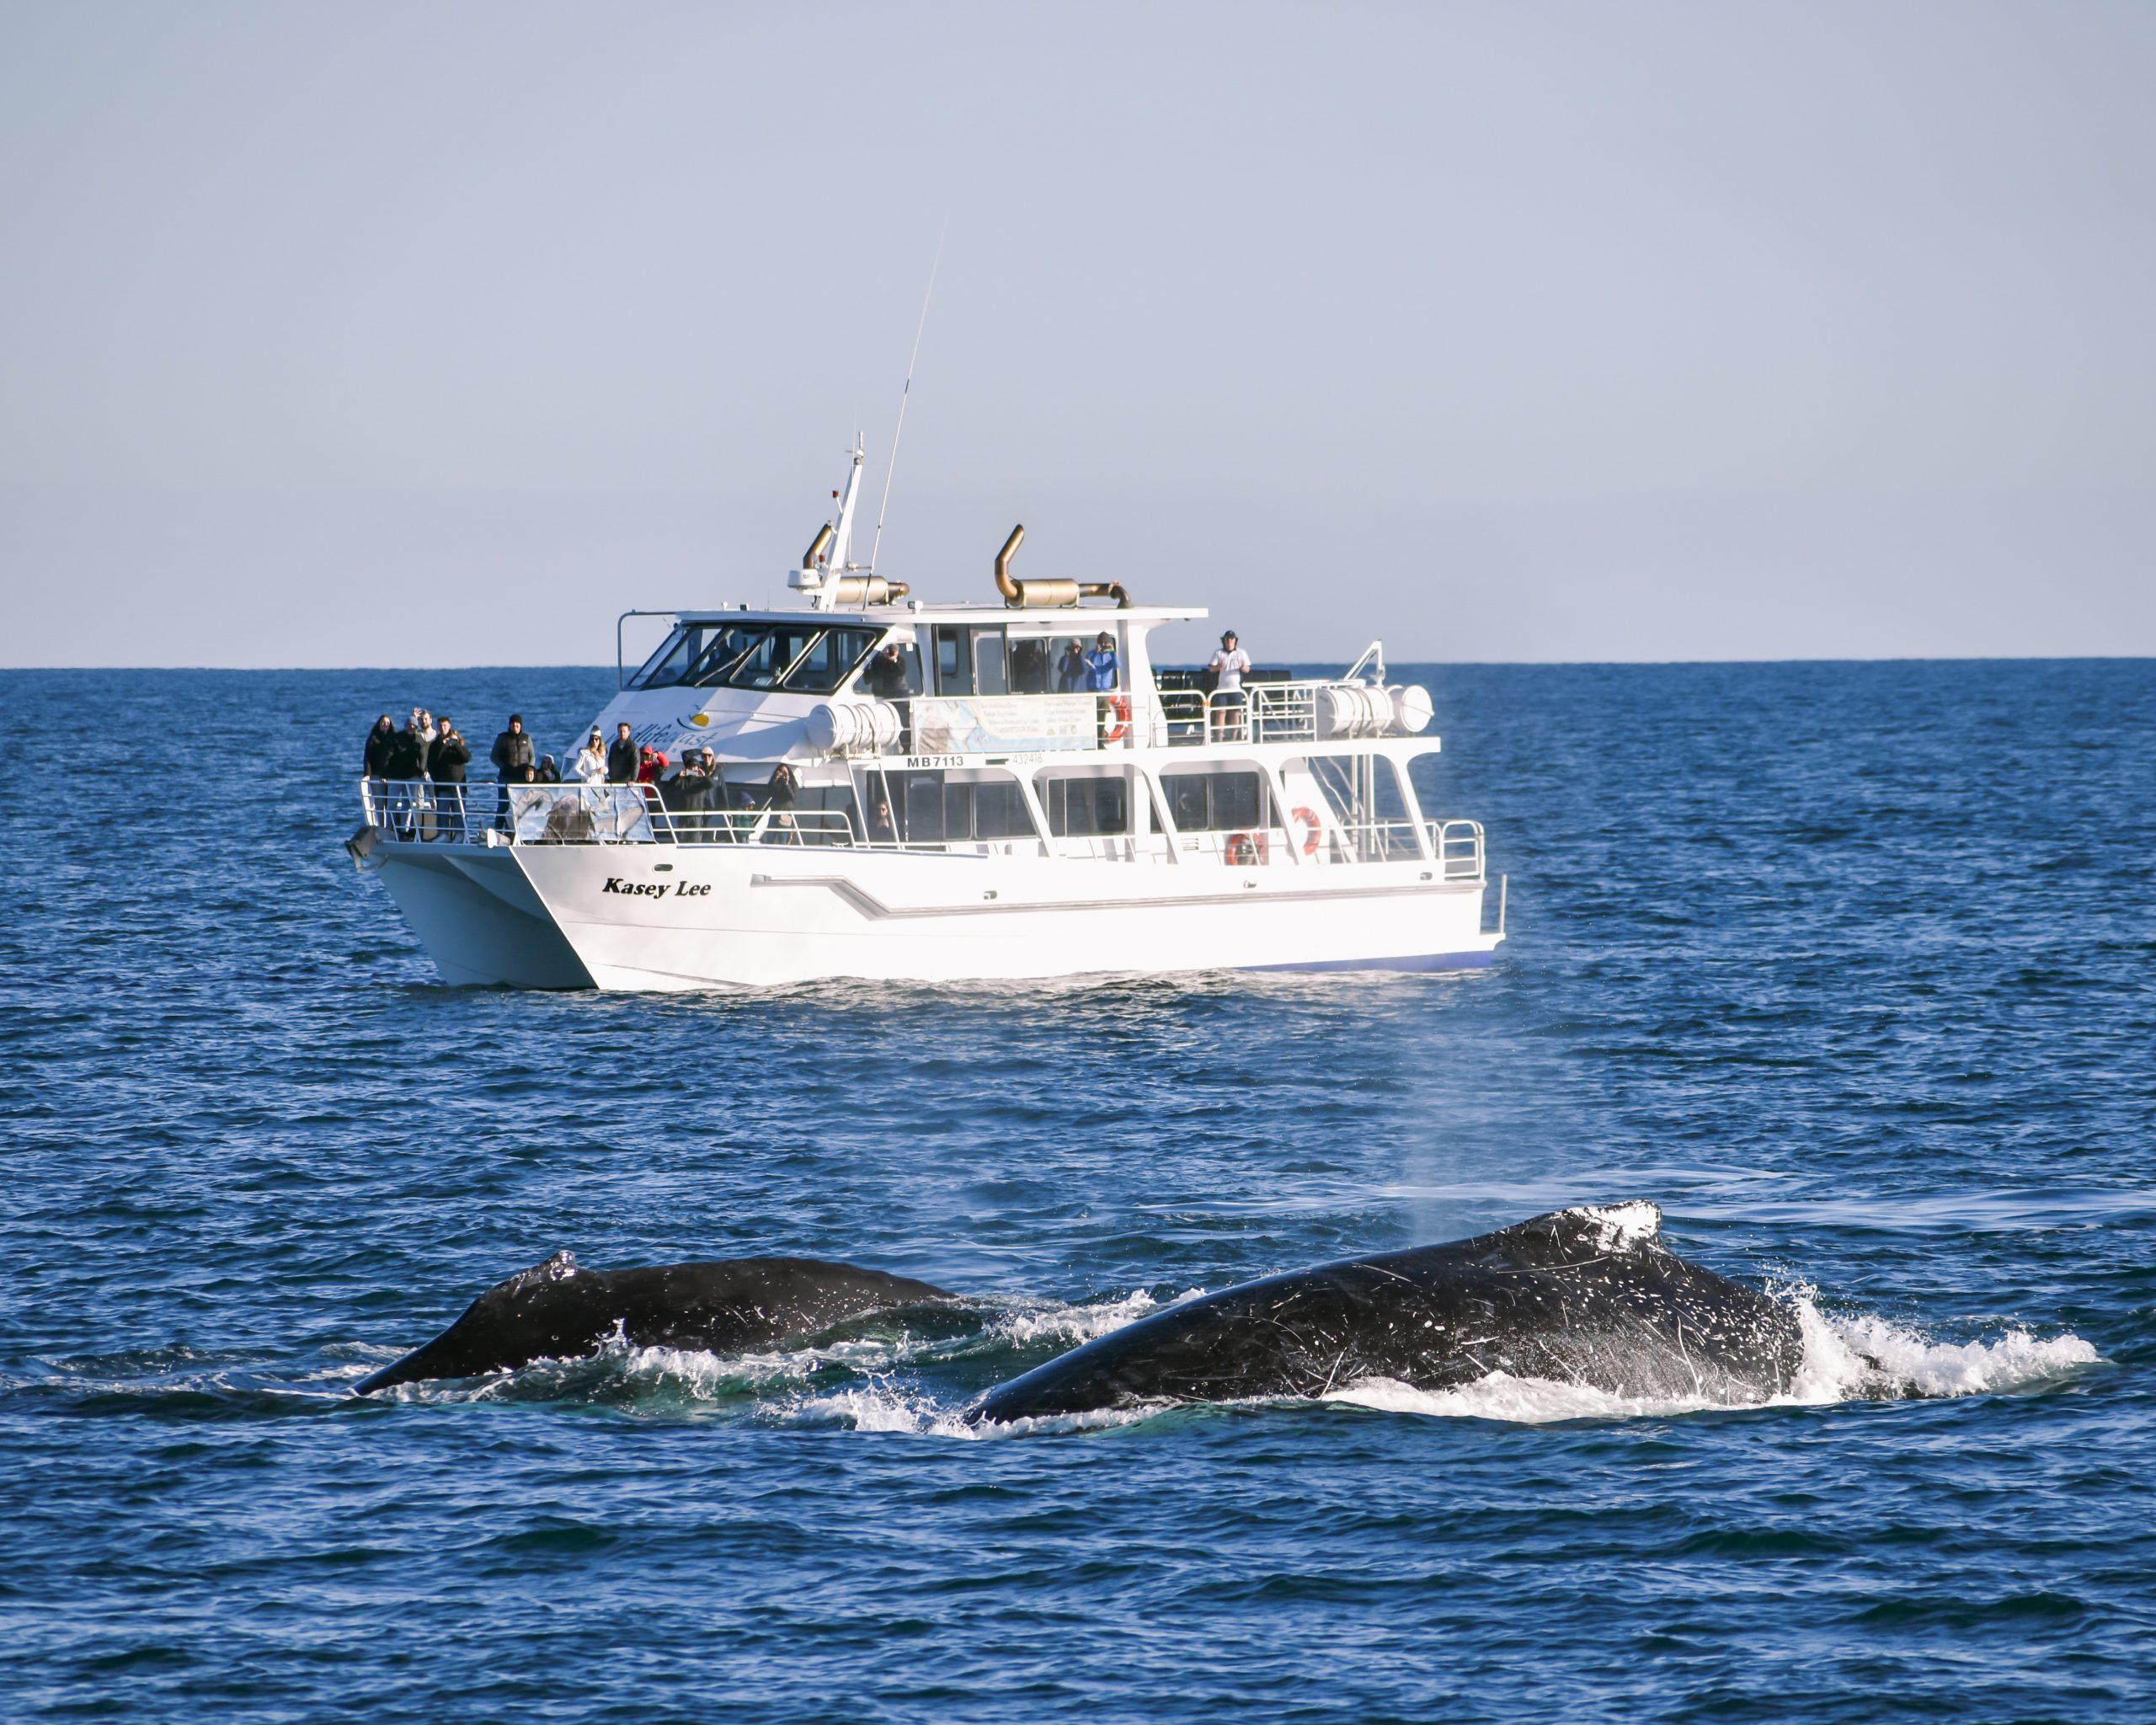 Island Whale Festival Phillip Island